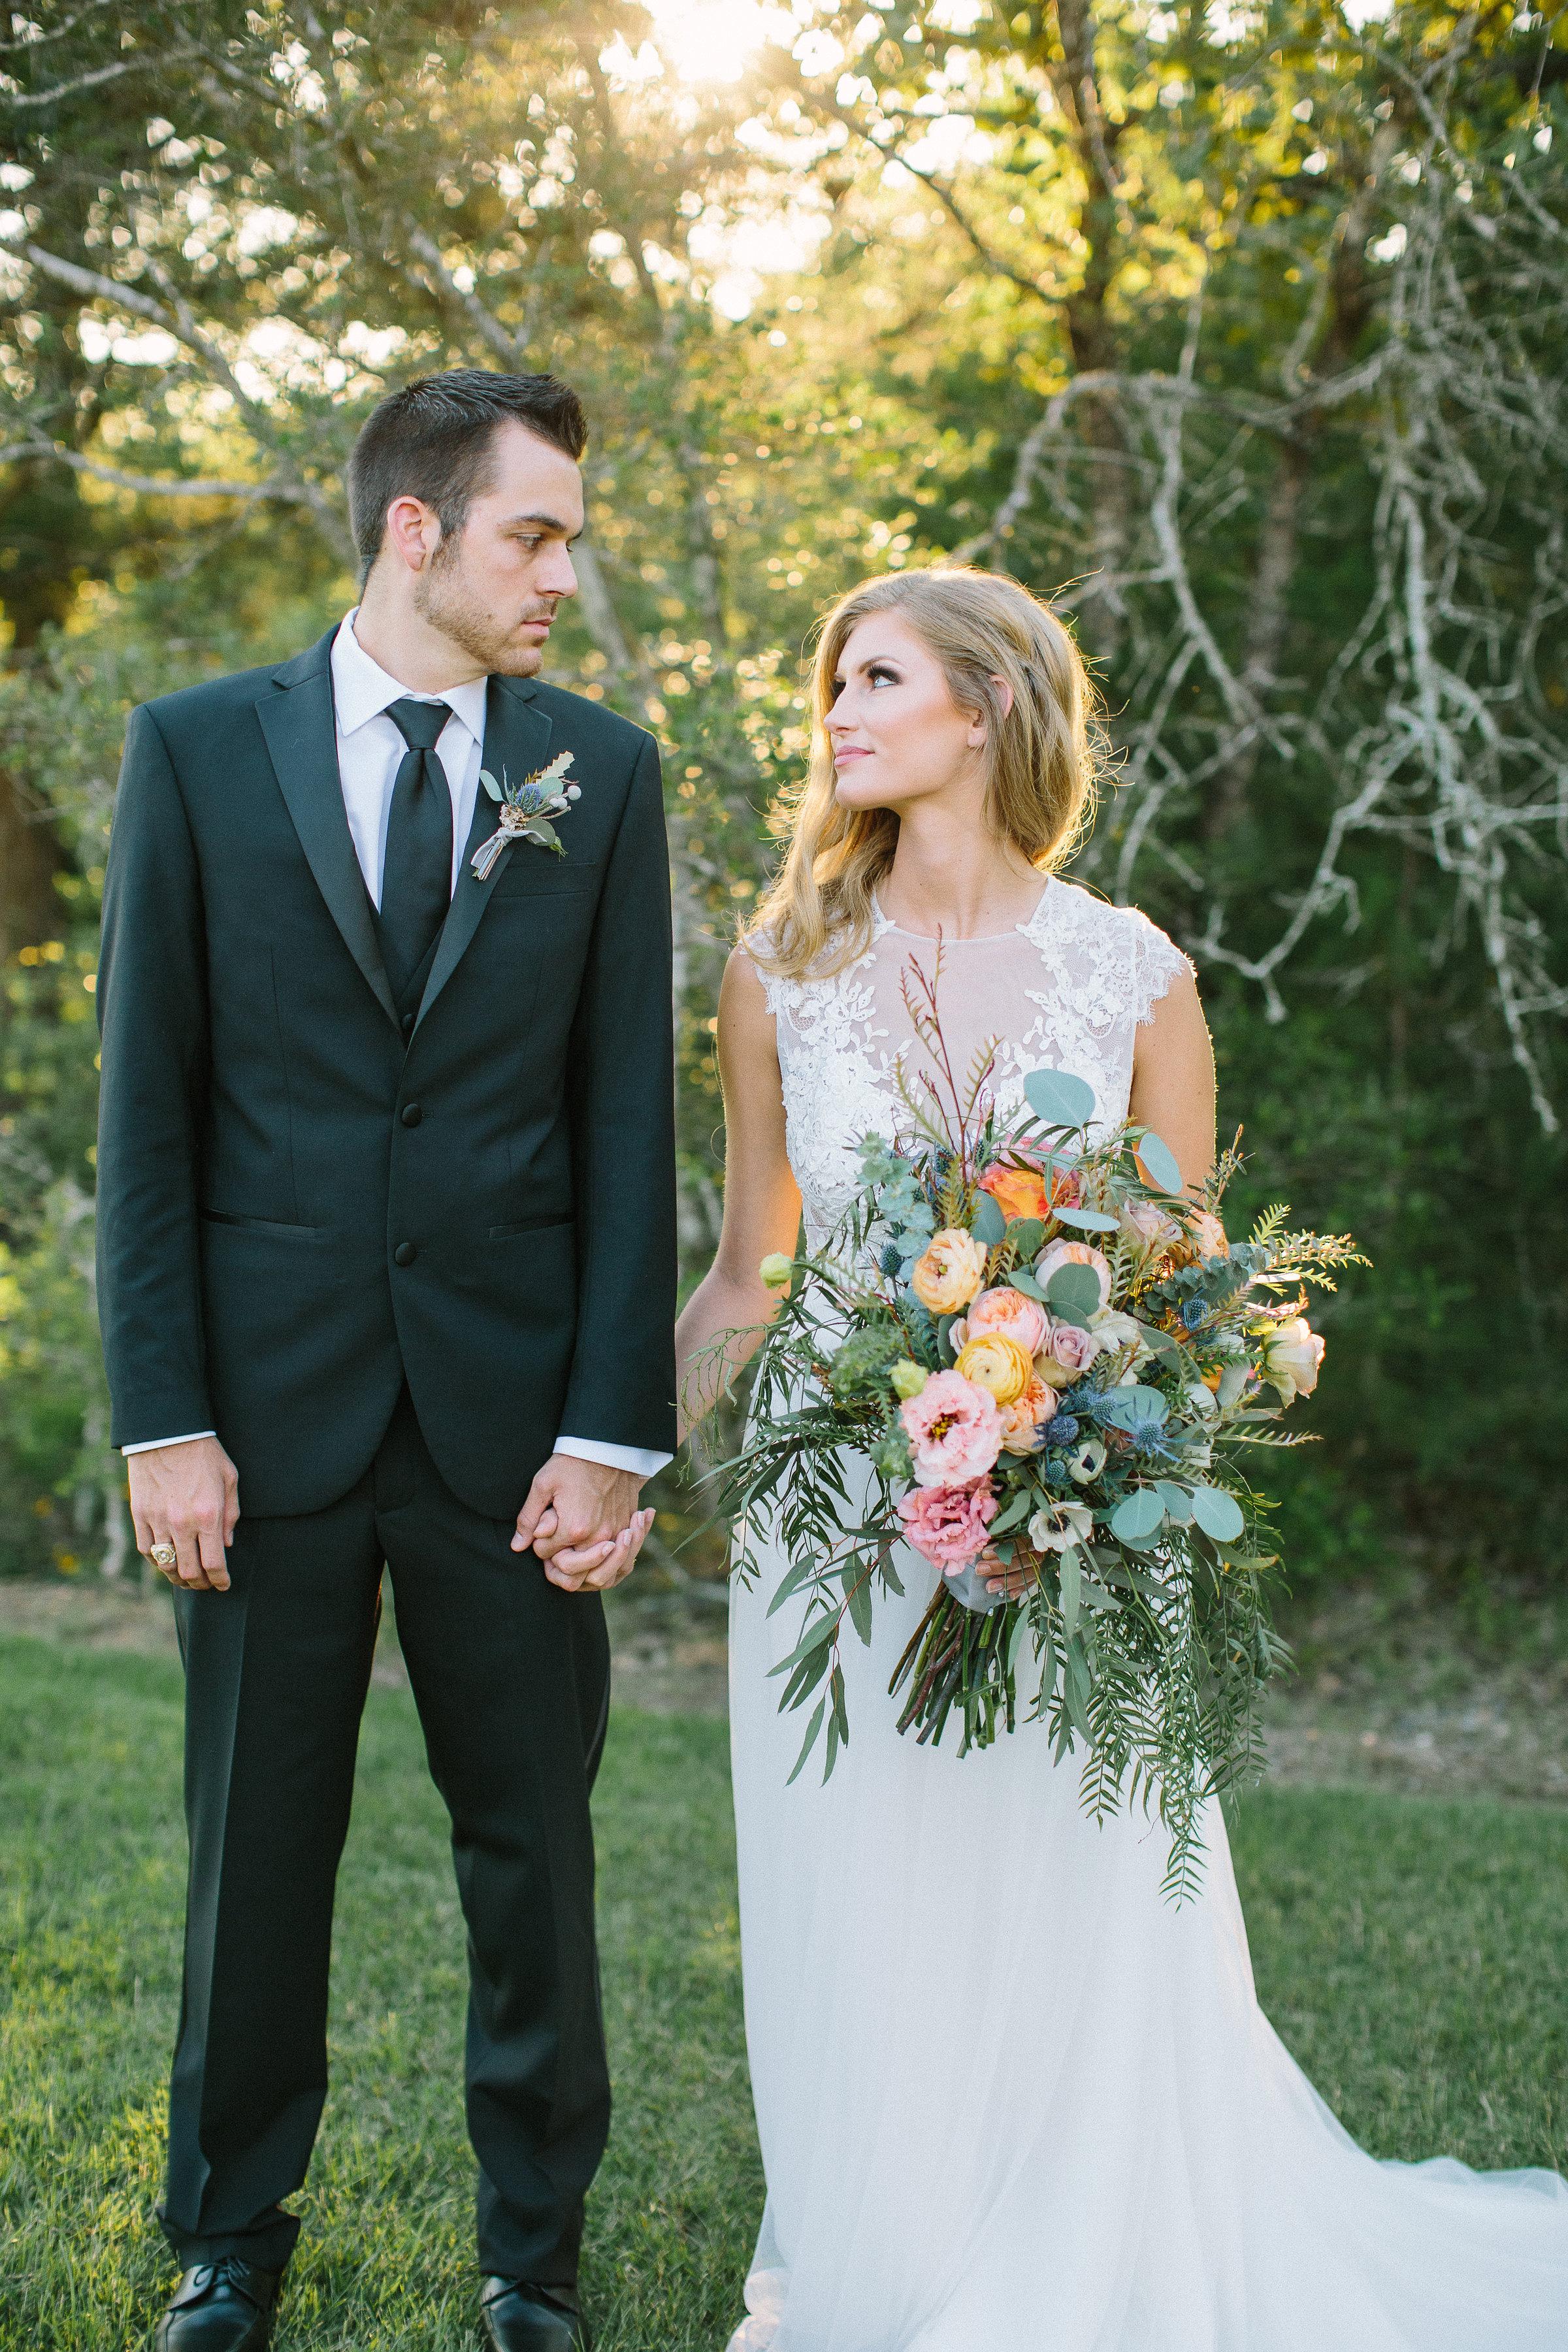 Ellen-Ashton-Photography-Peach-Creek-Ranch-Weddings-Wed-and-Prosper283